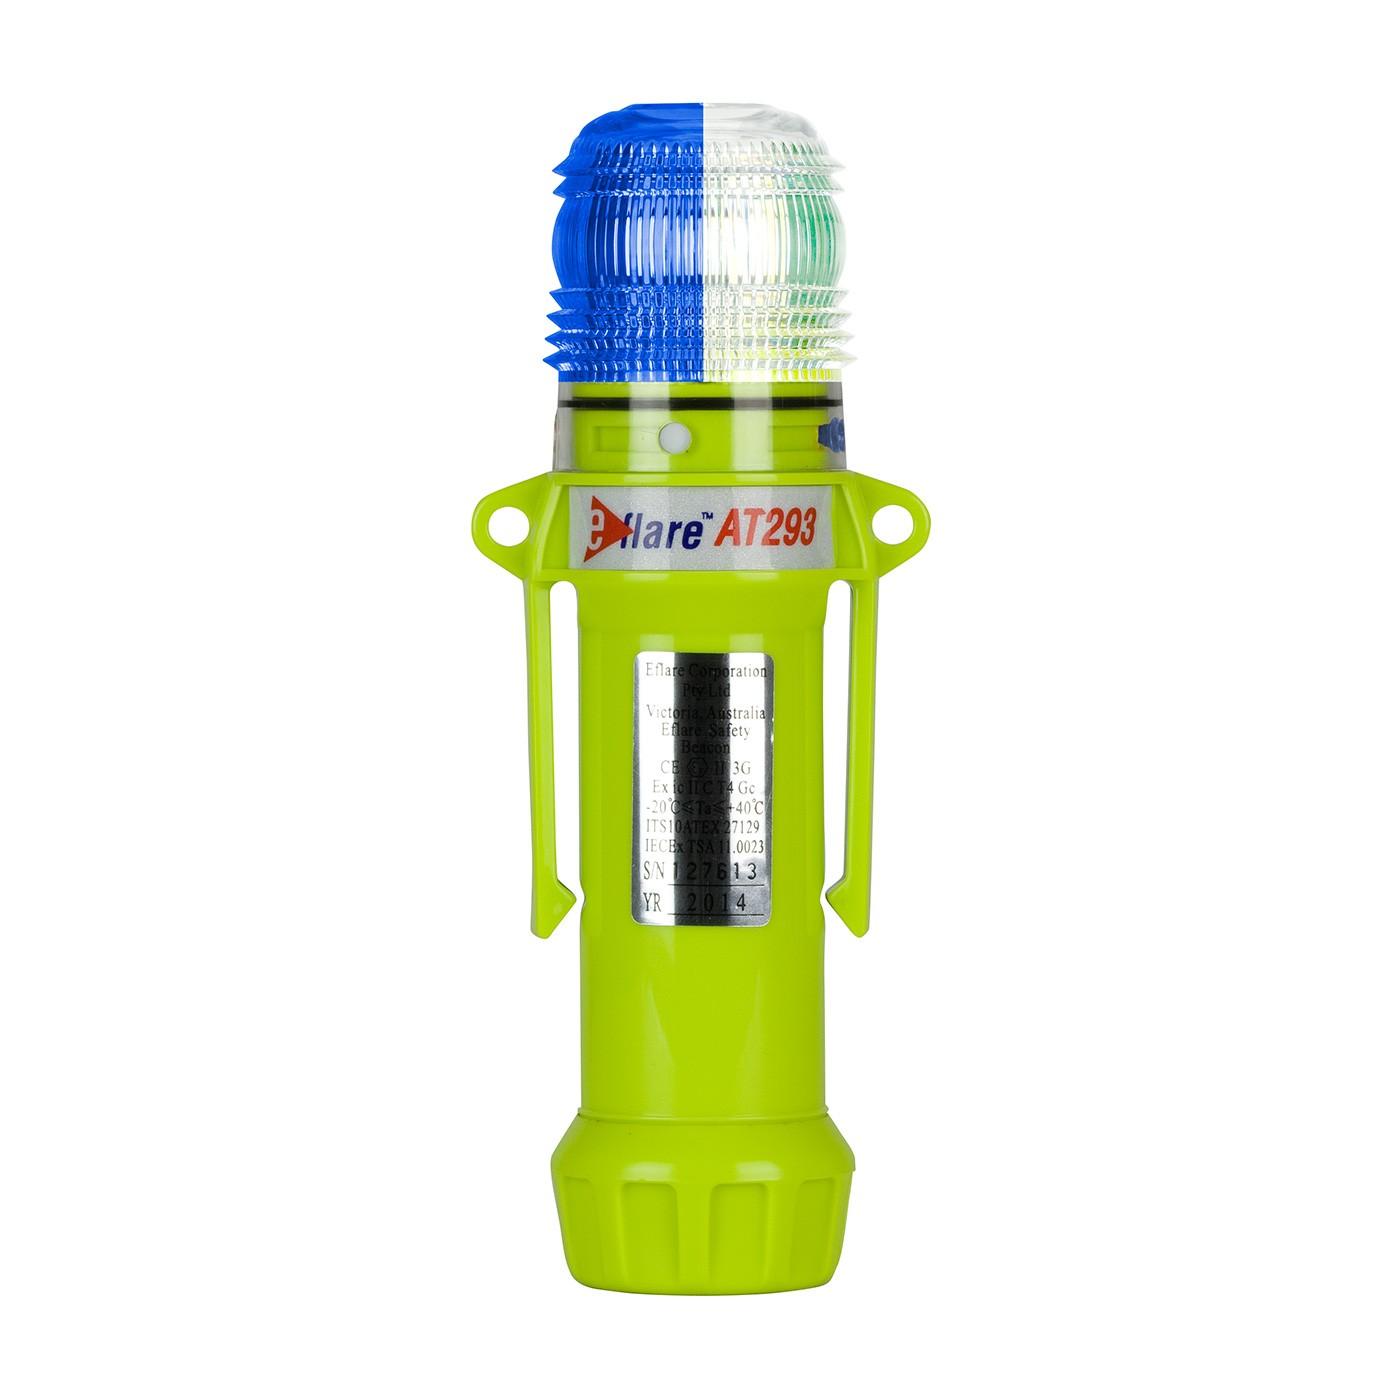 "Eflare™ 8"" Safety & Emergency Beacon - Alternating Blue/White  (#939-AT293-B/W)"